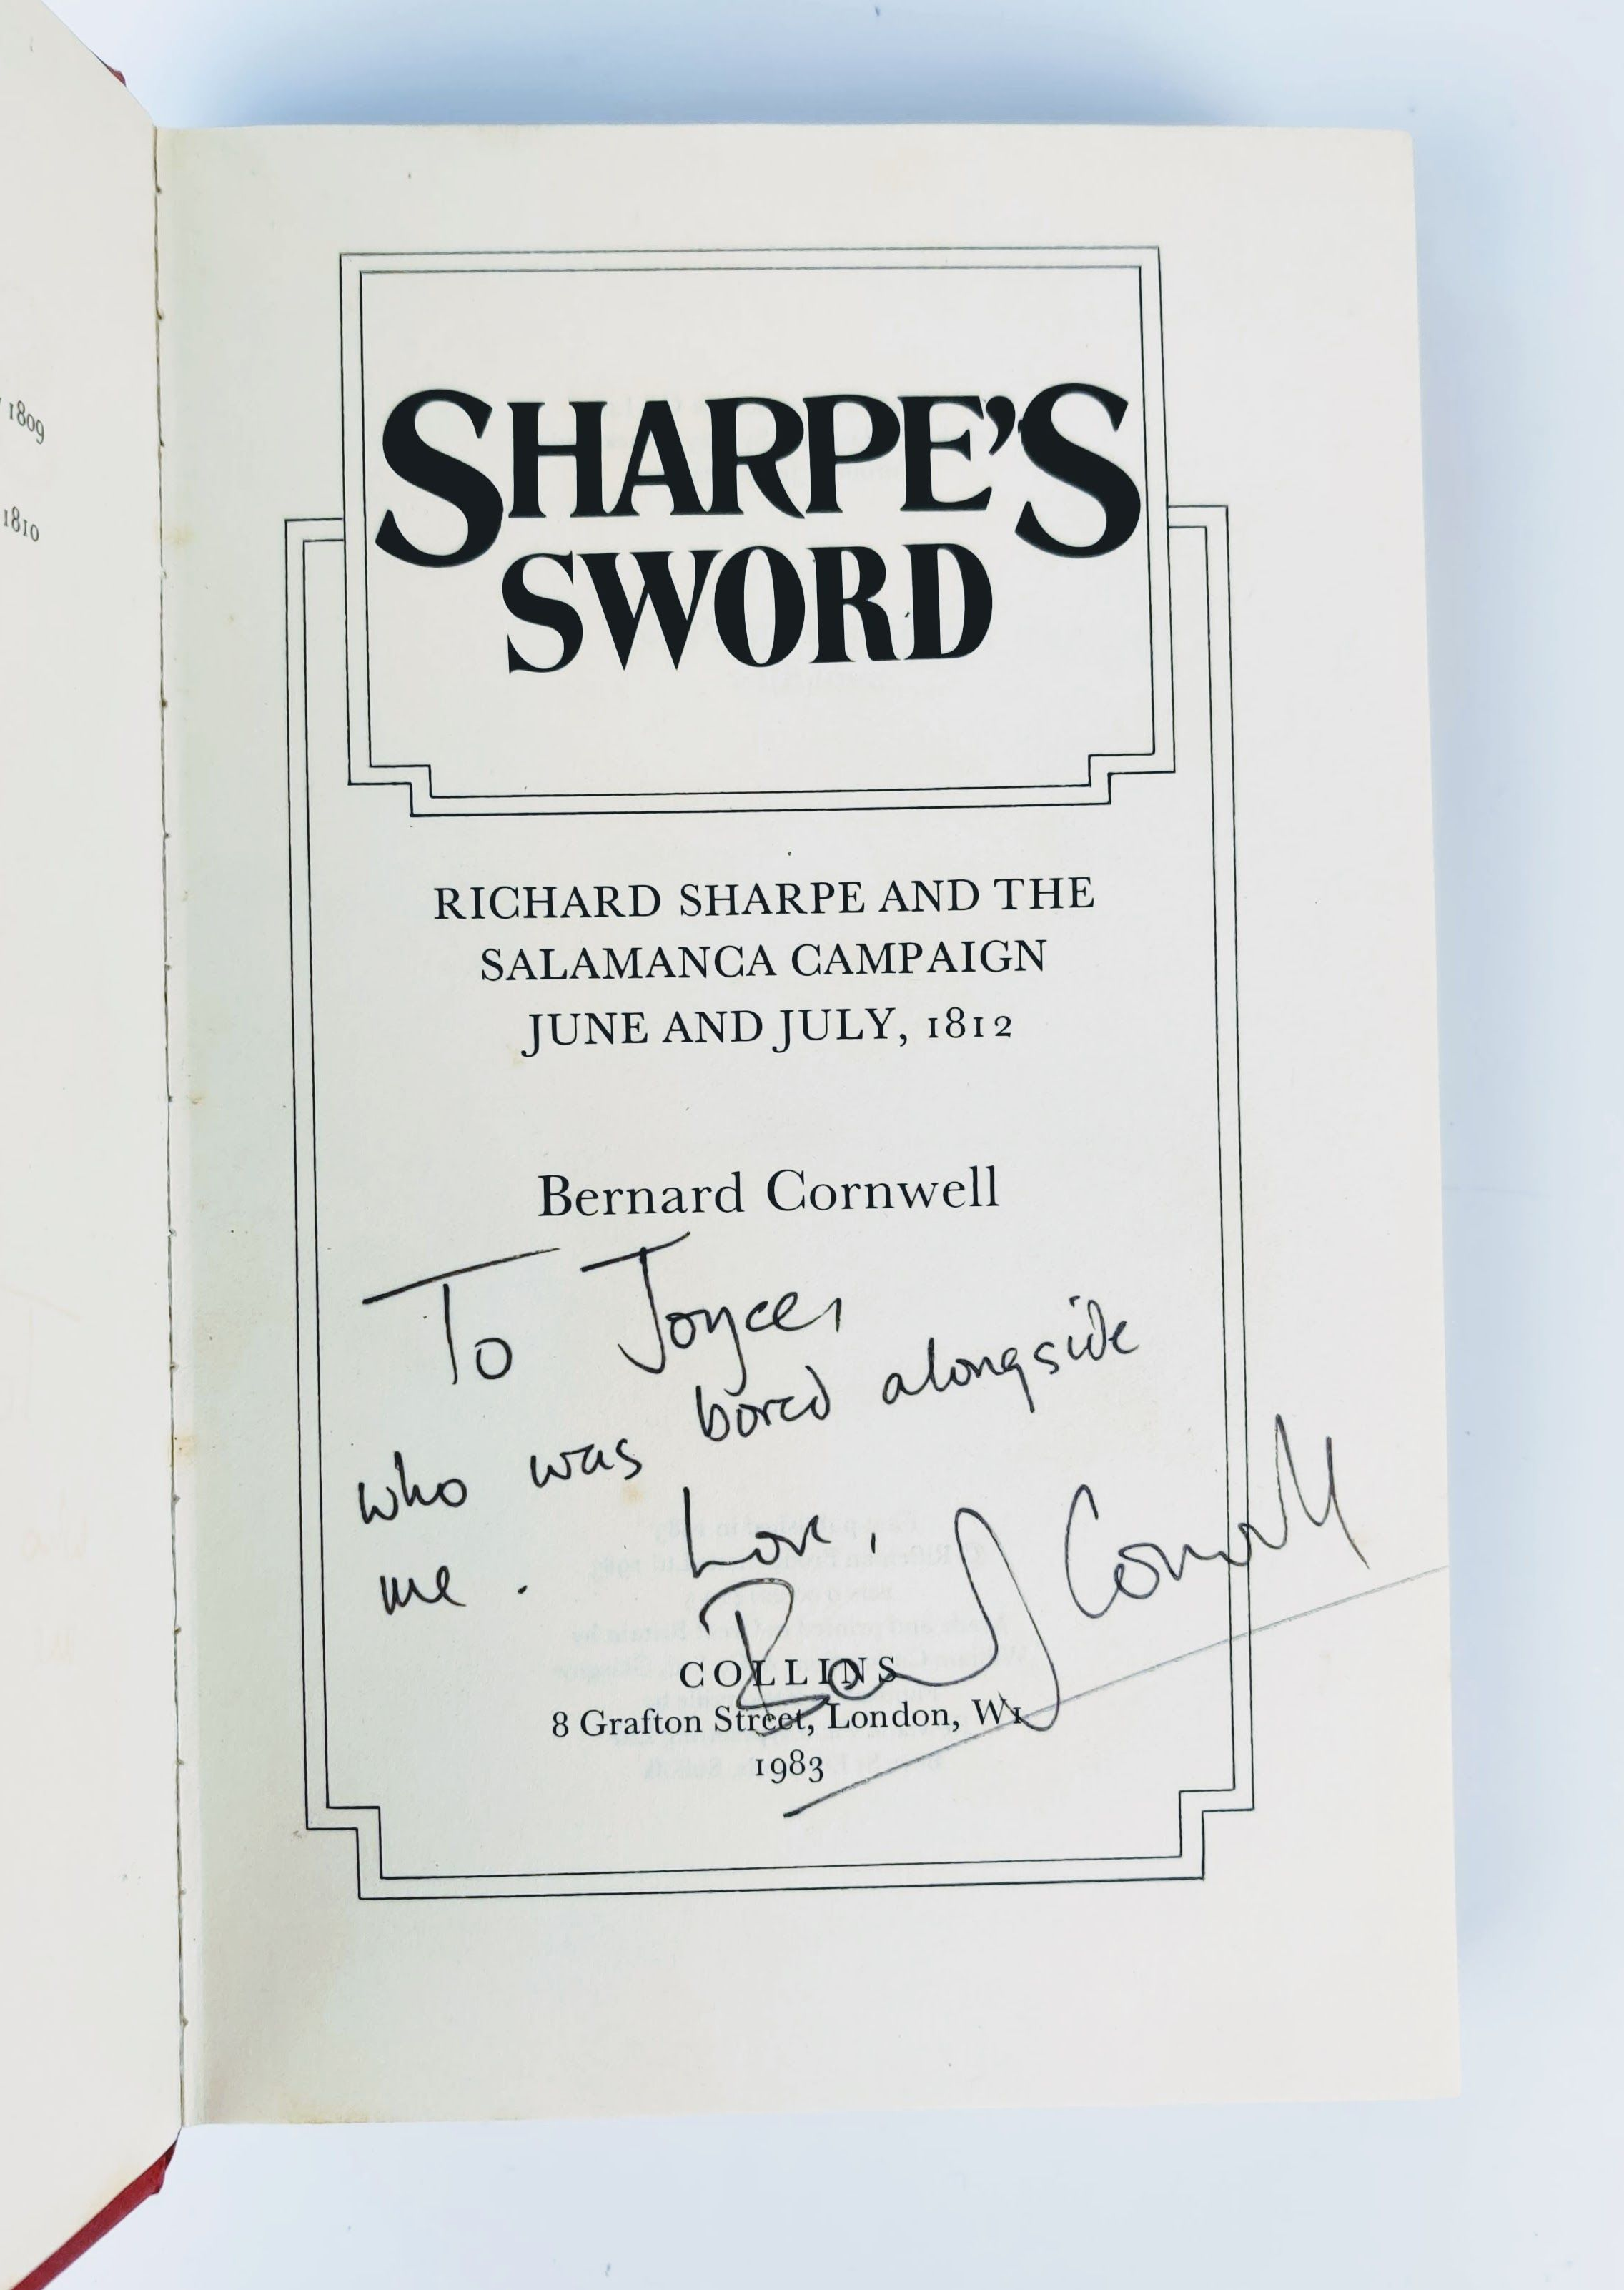 Sharpe's Sword (photo 5)